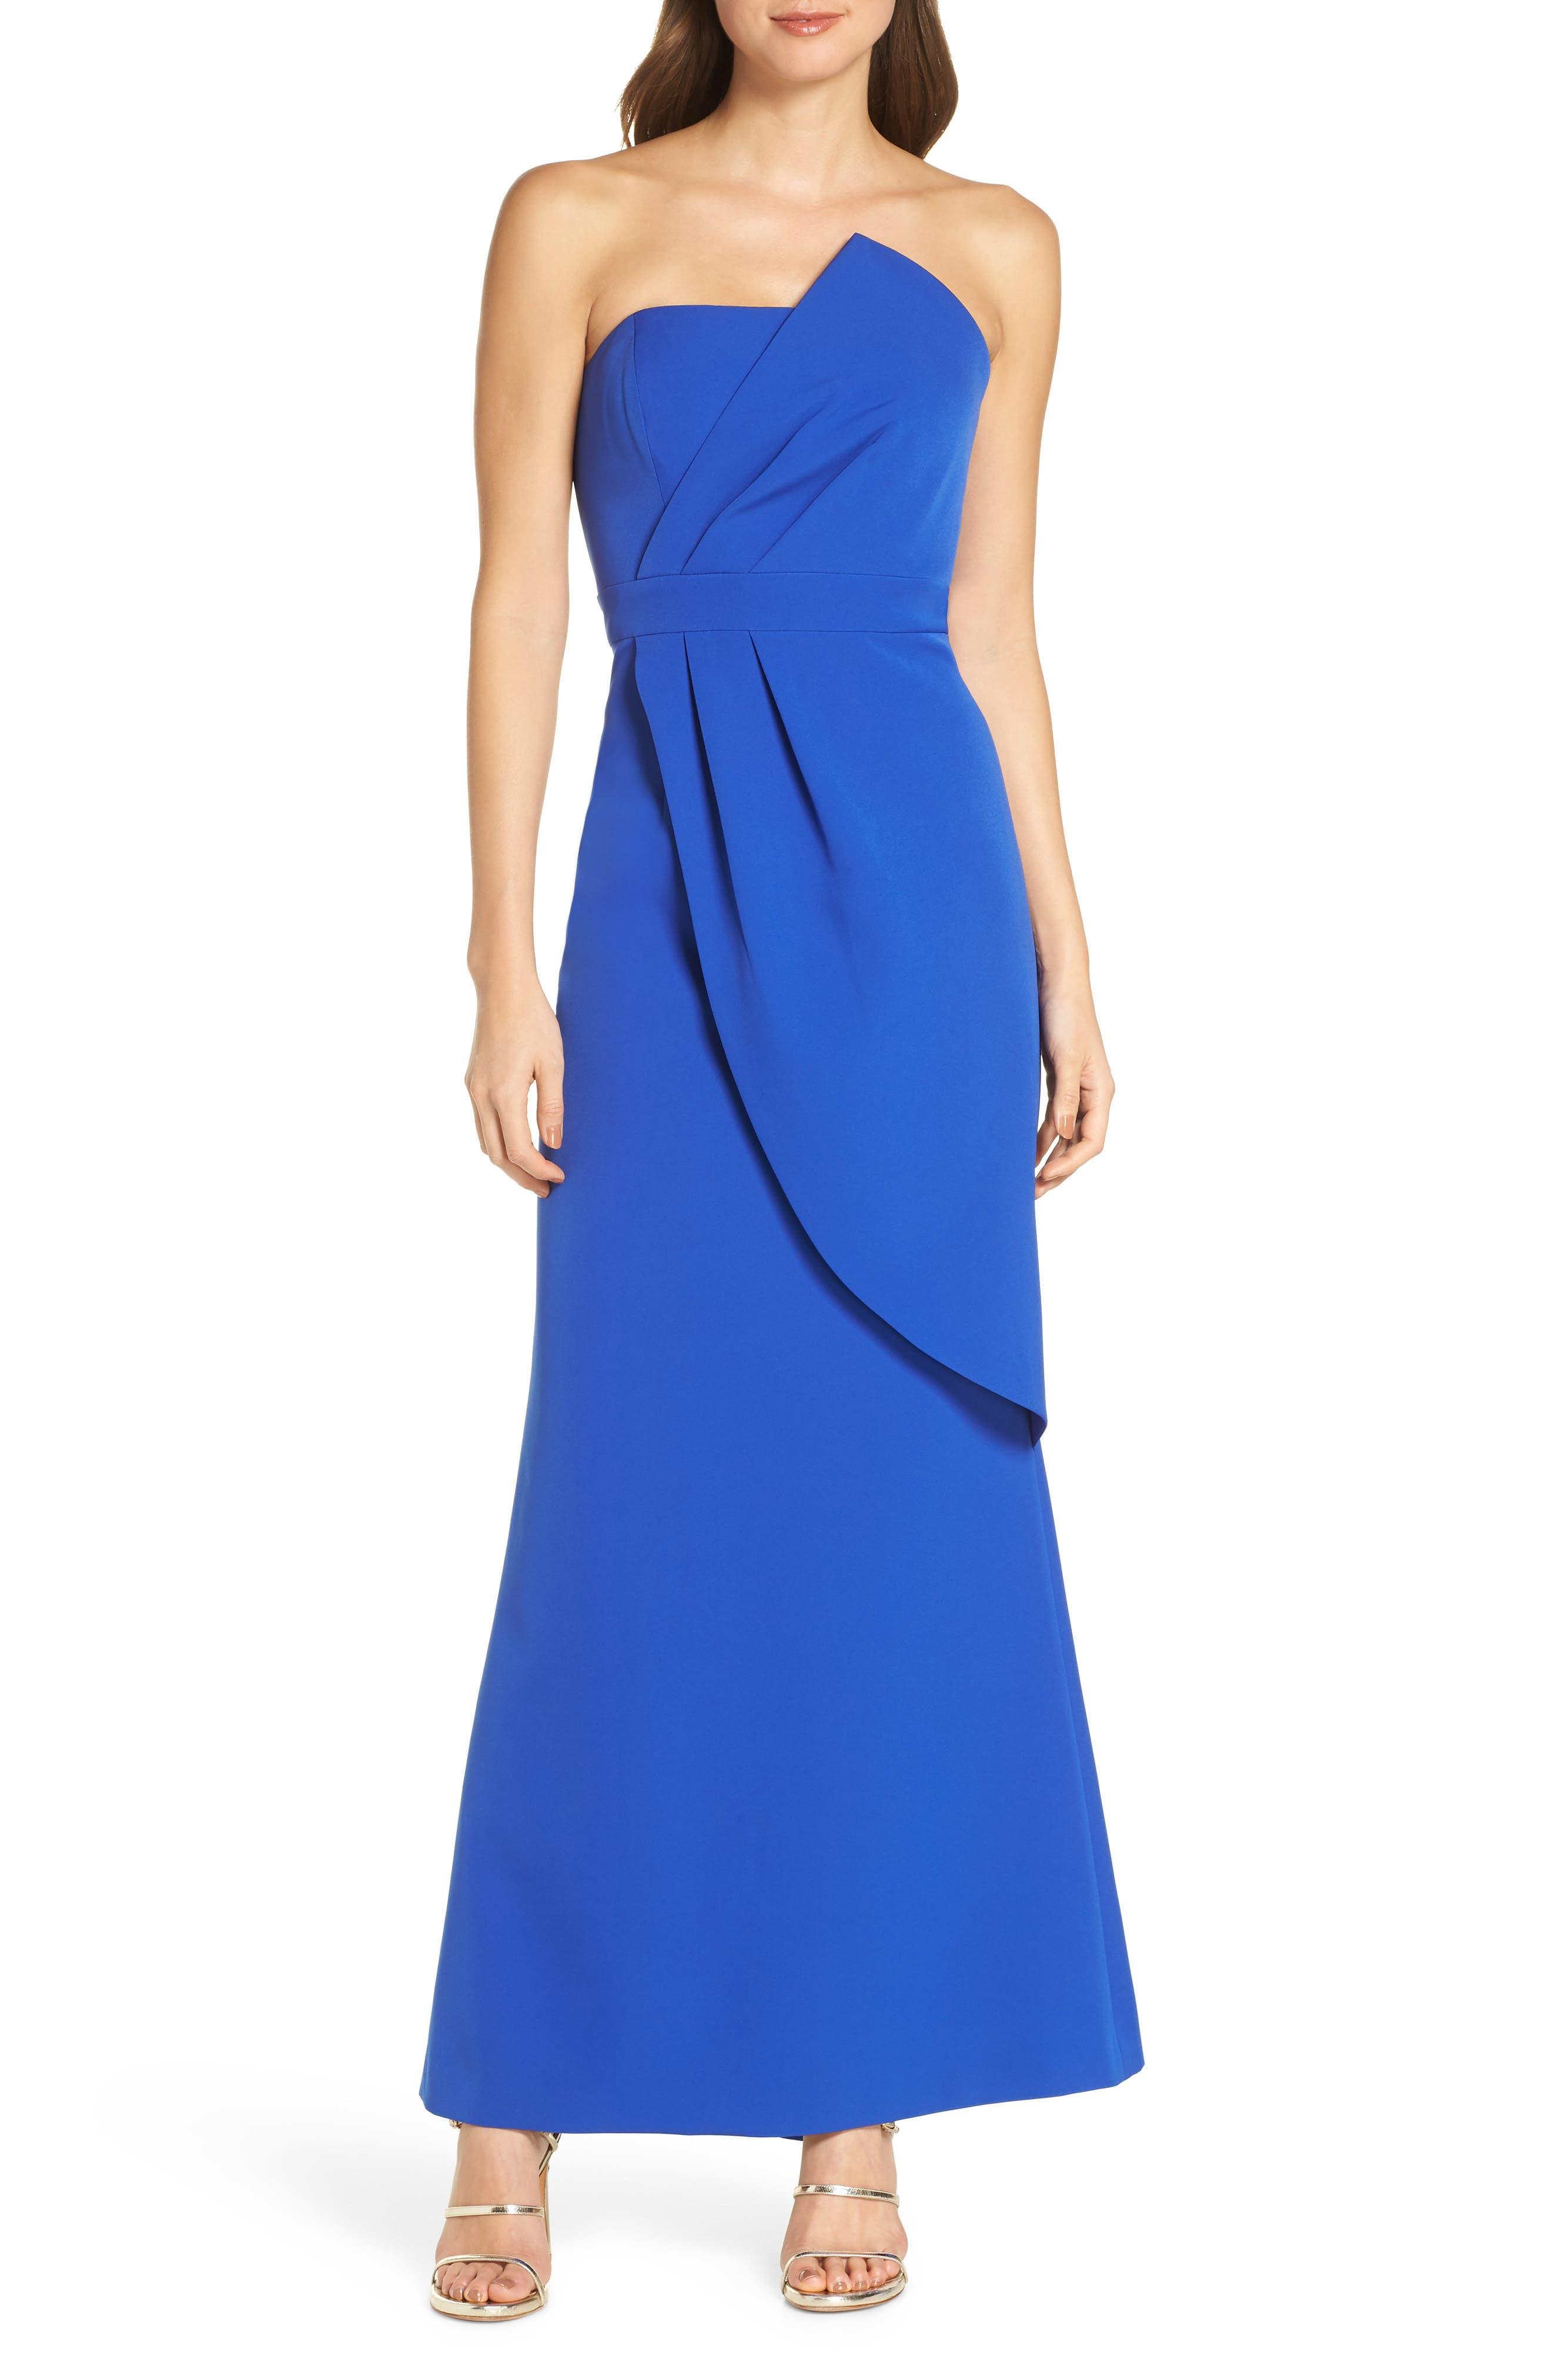 Vince Camuto Strapless Faux Wrap Evening Dress, Blue